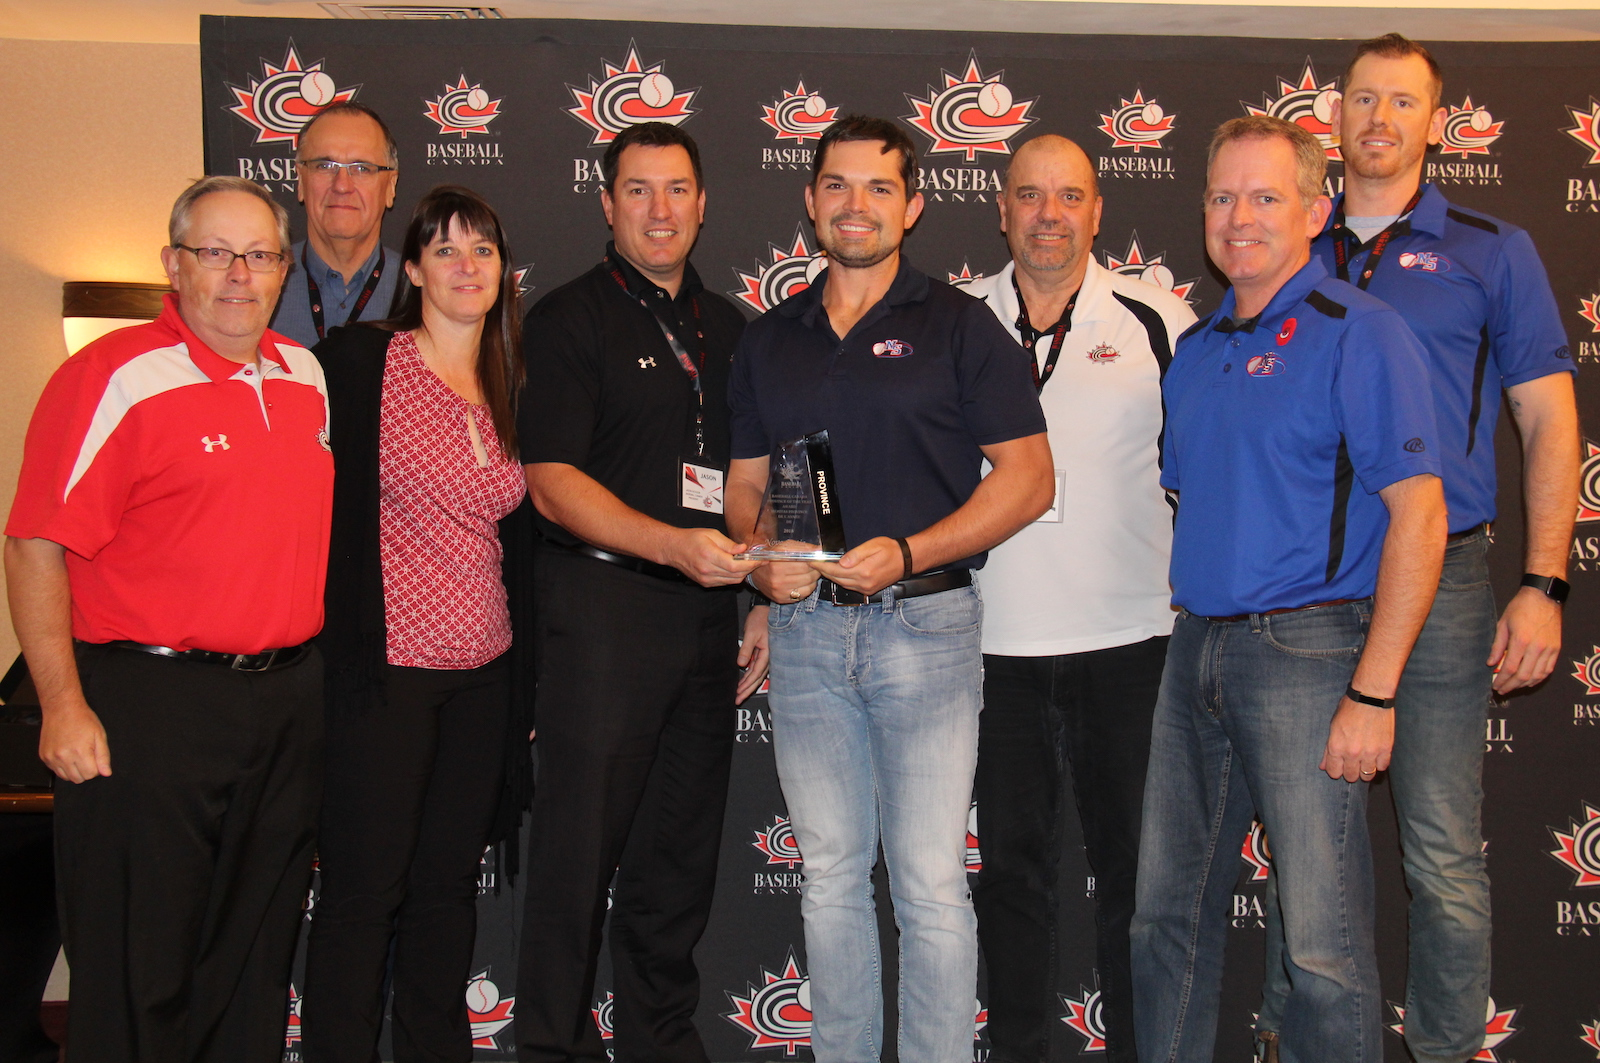 Representatives from Baseball Nova Scotia accept Baseball Canada's Province of the Year award. Photo Credit: Baseball Canada